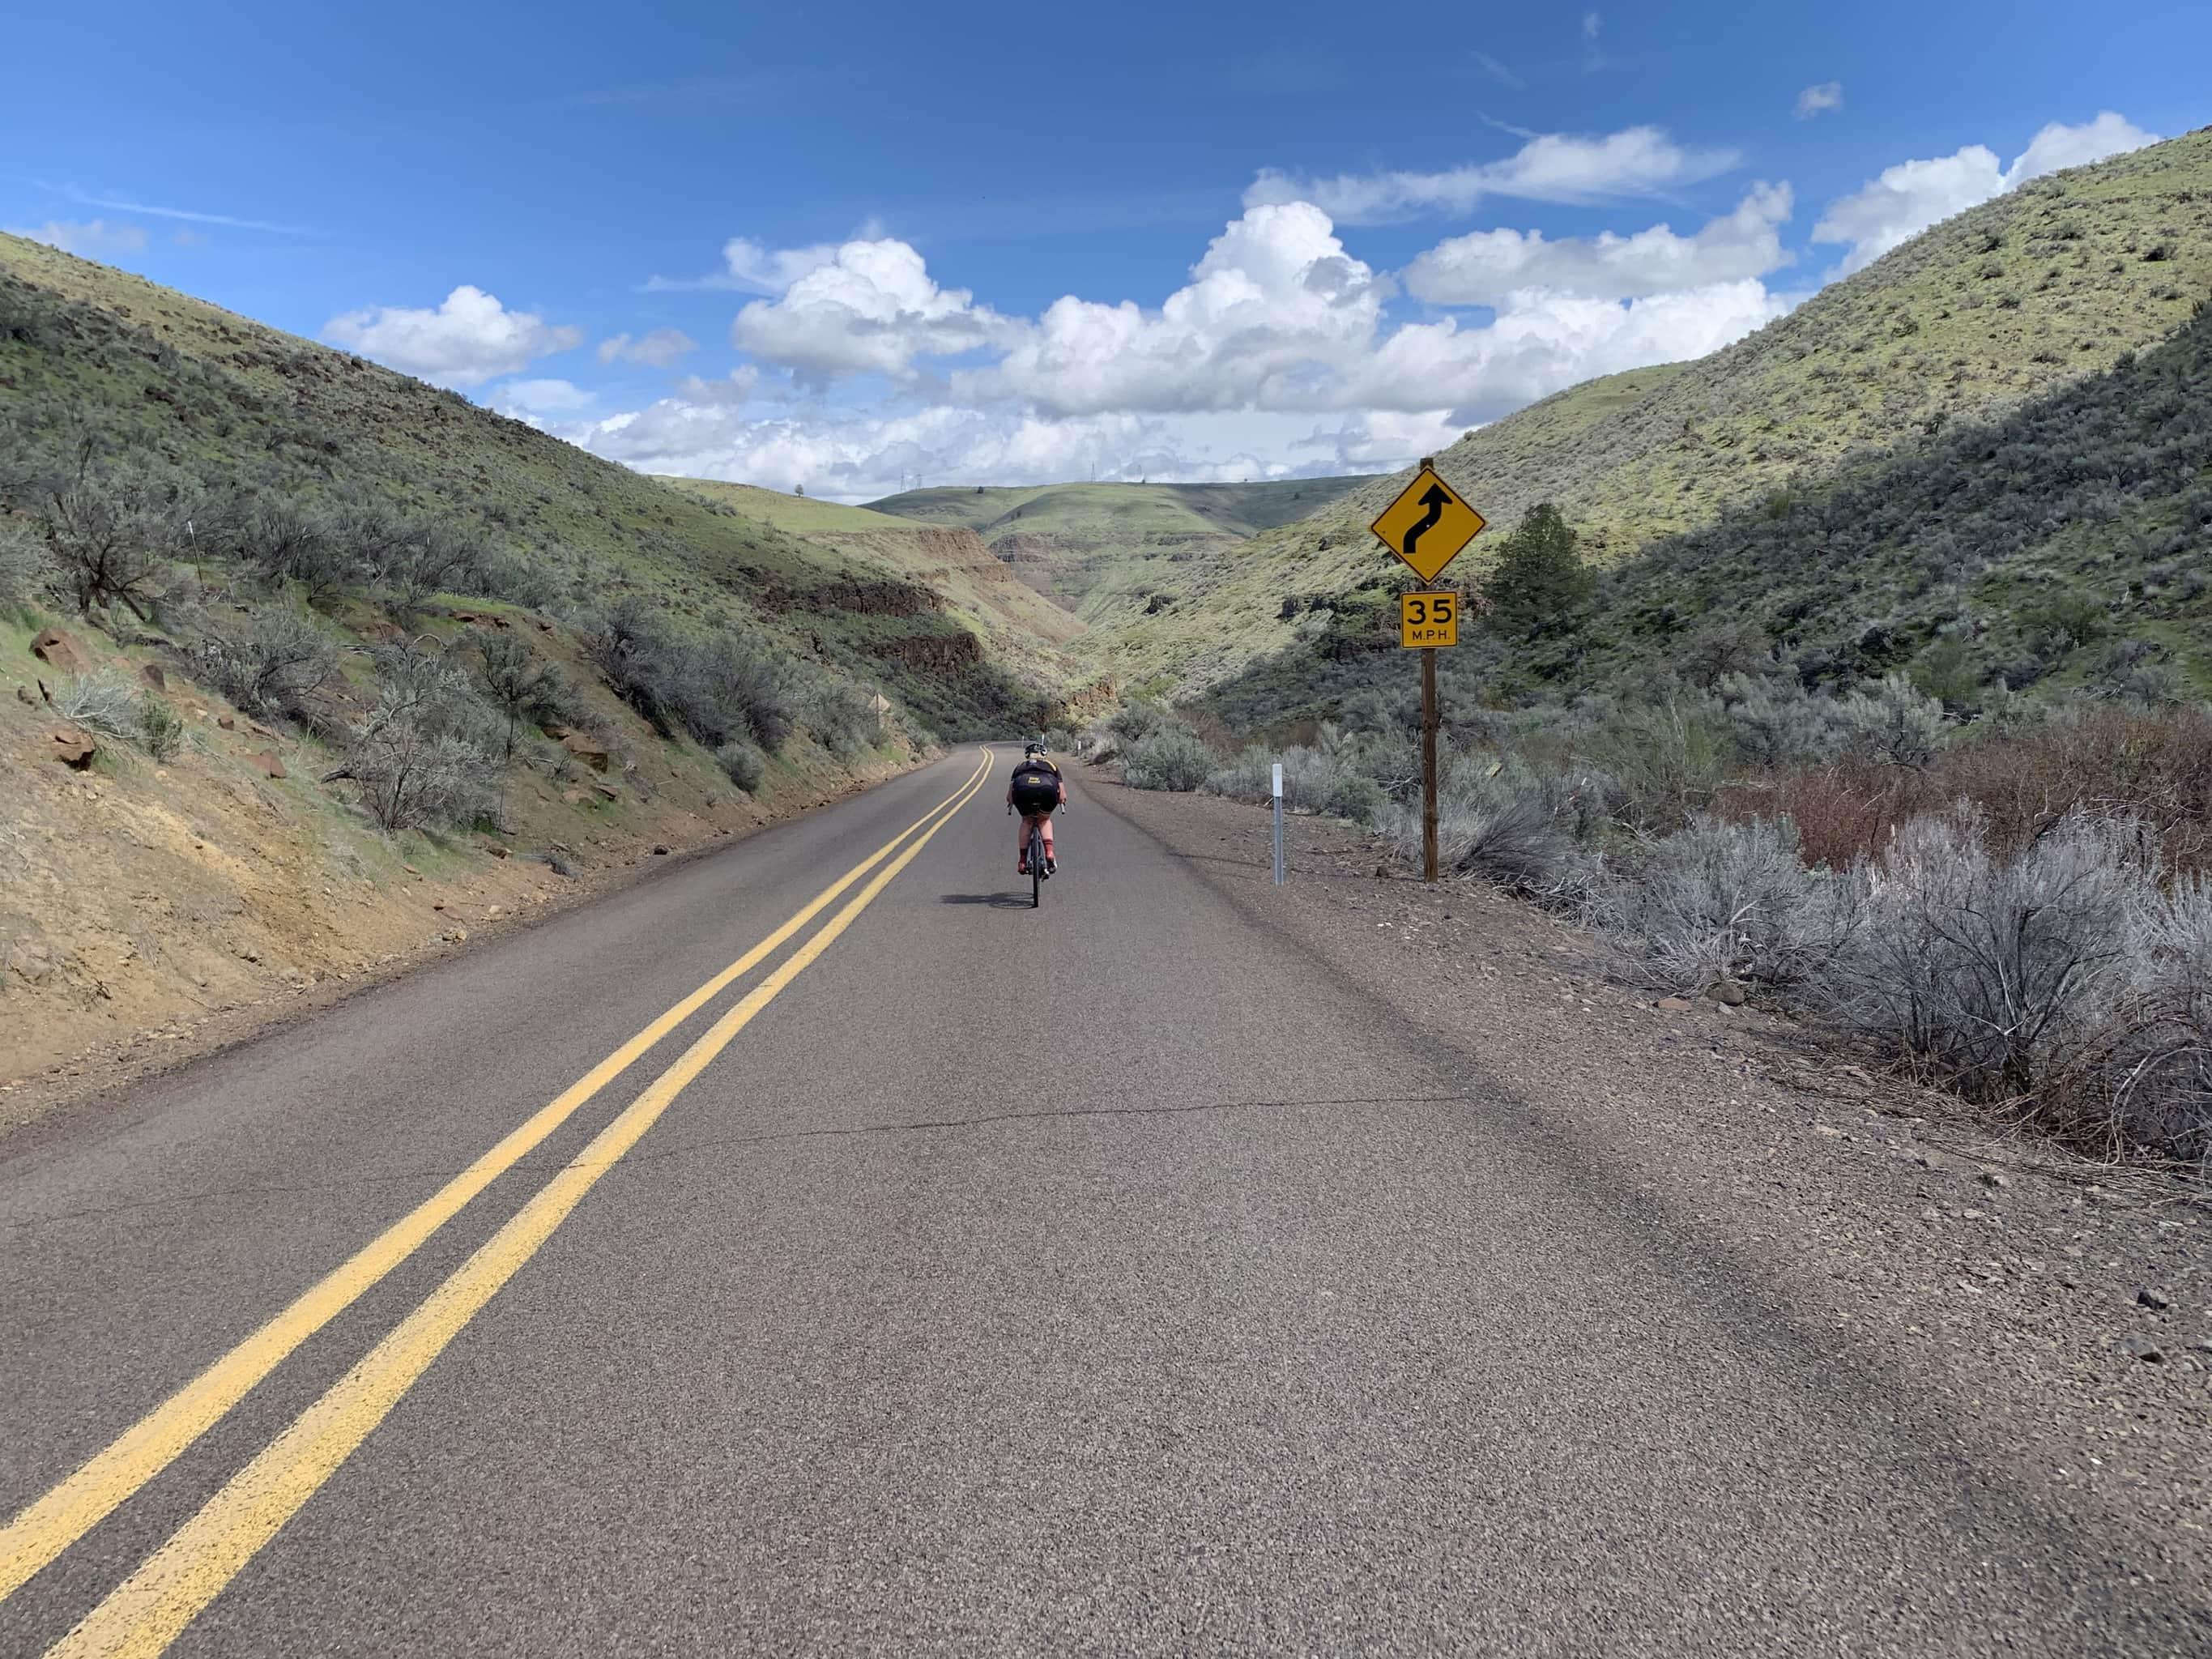 Maupin City Park sign.